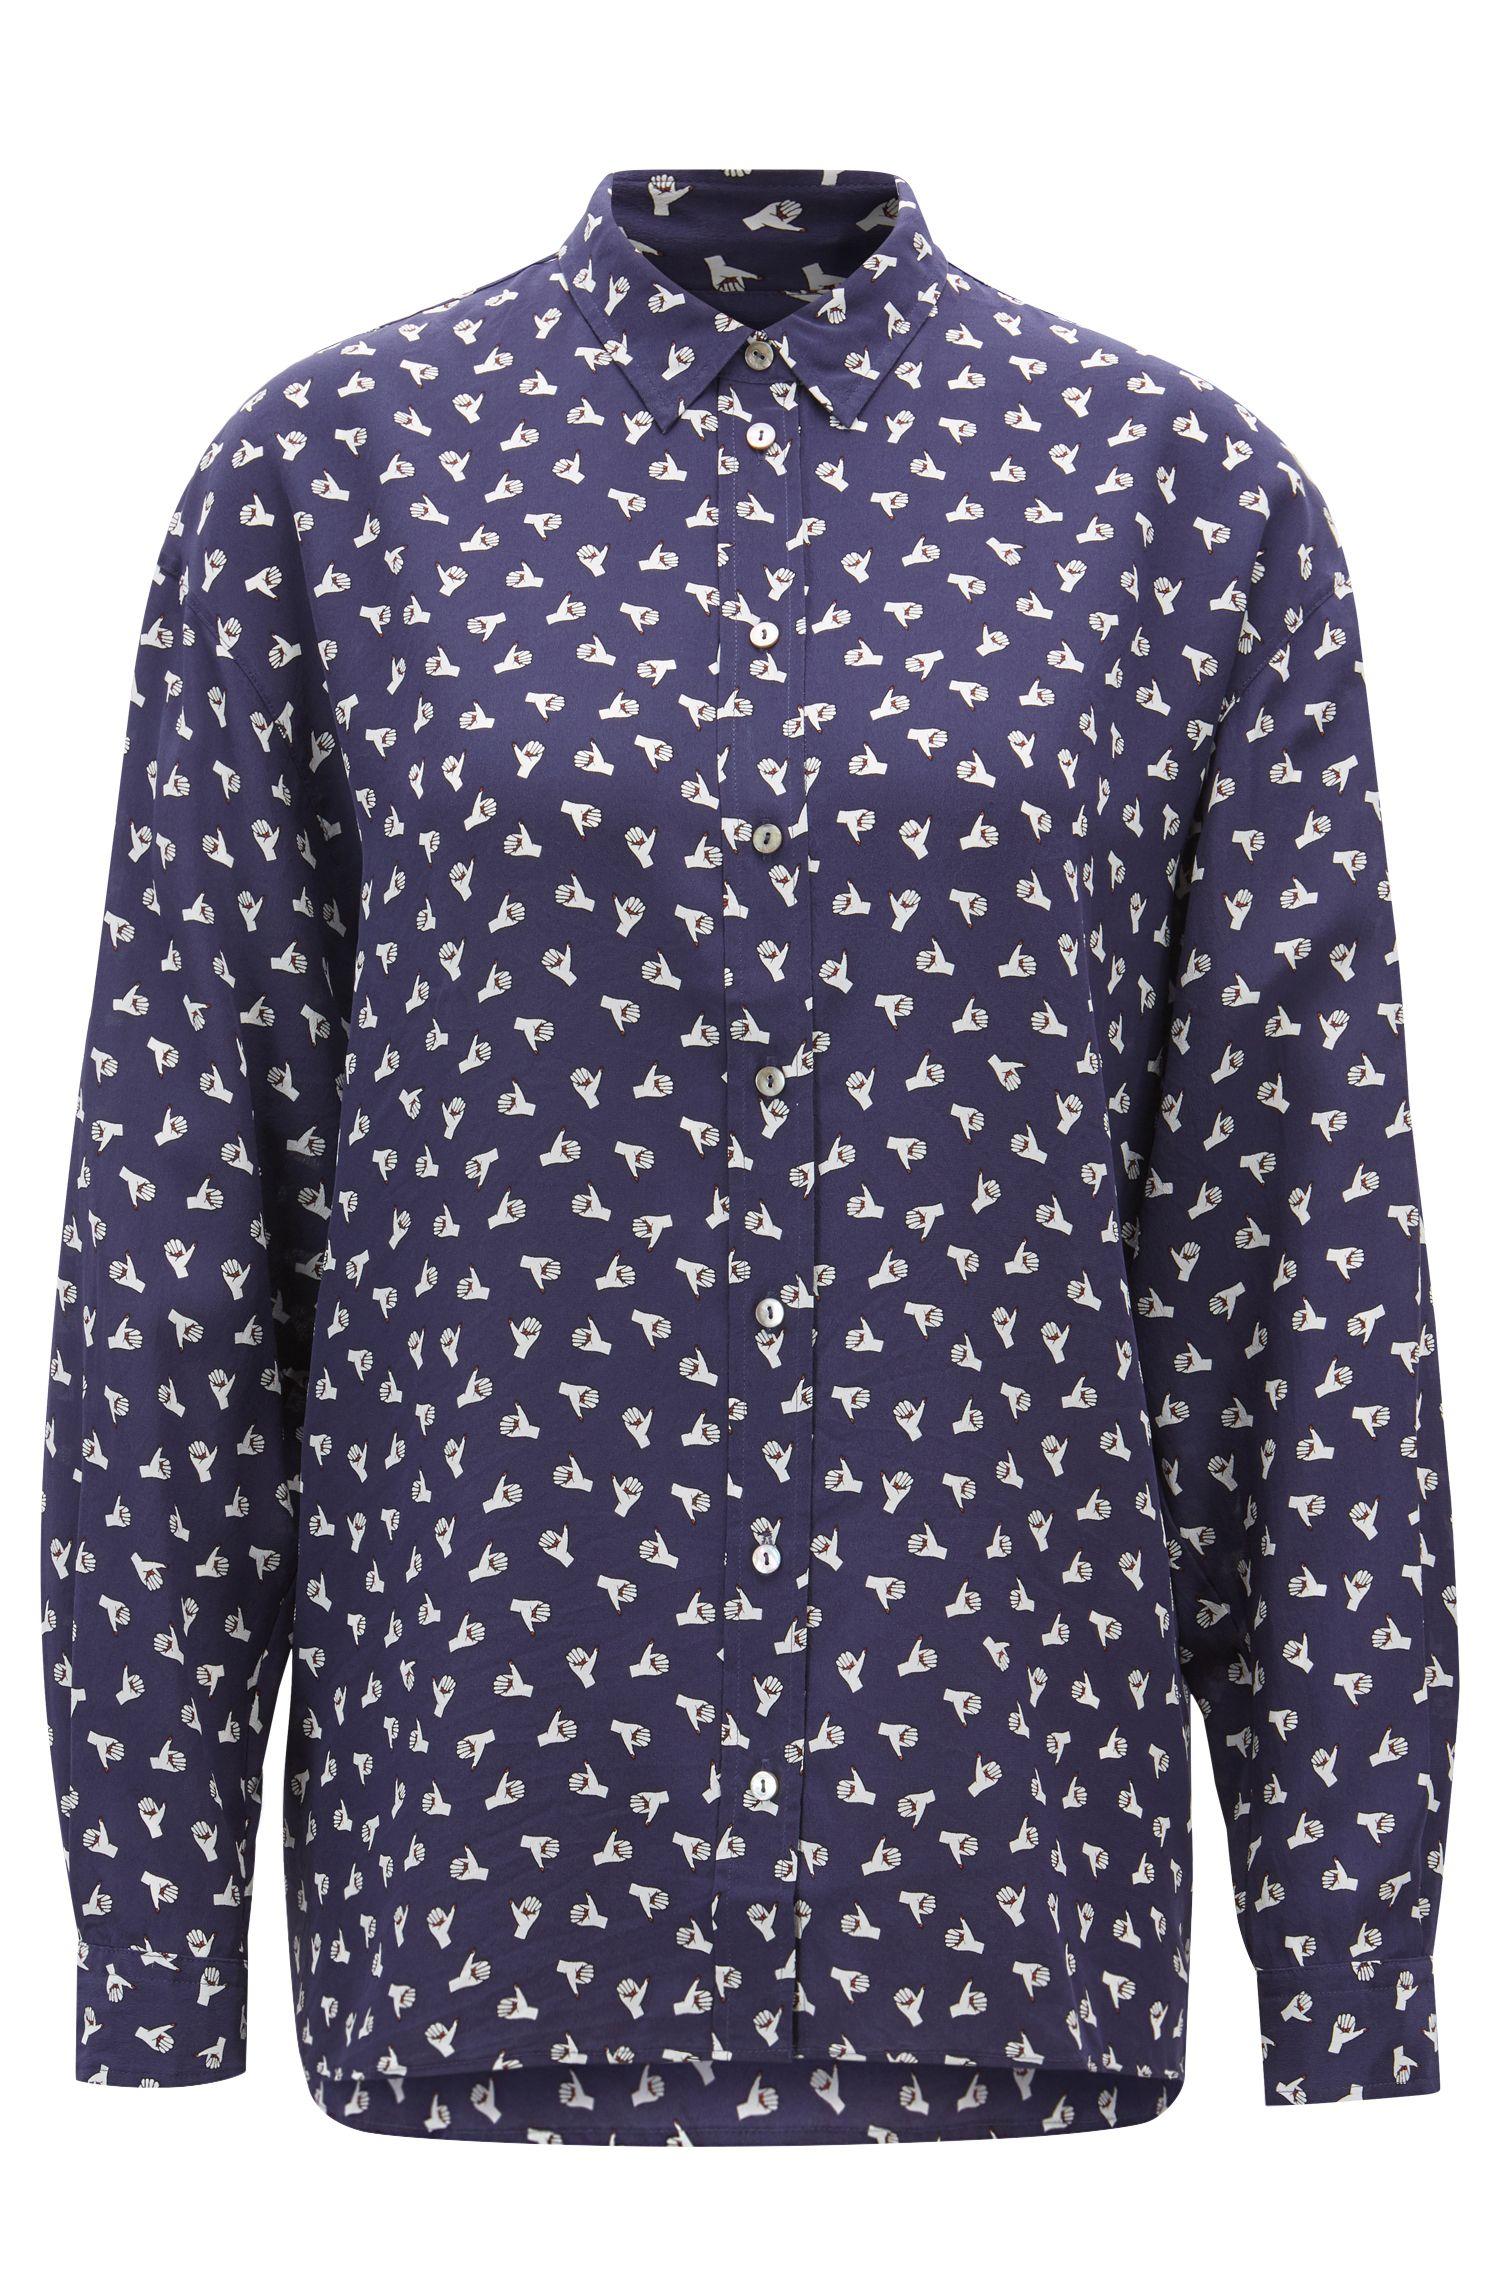 Oversized Bluse aus bedruckter Seide, Gemustert